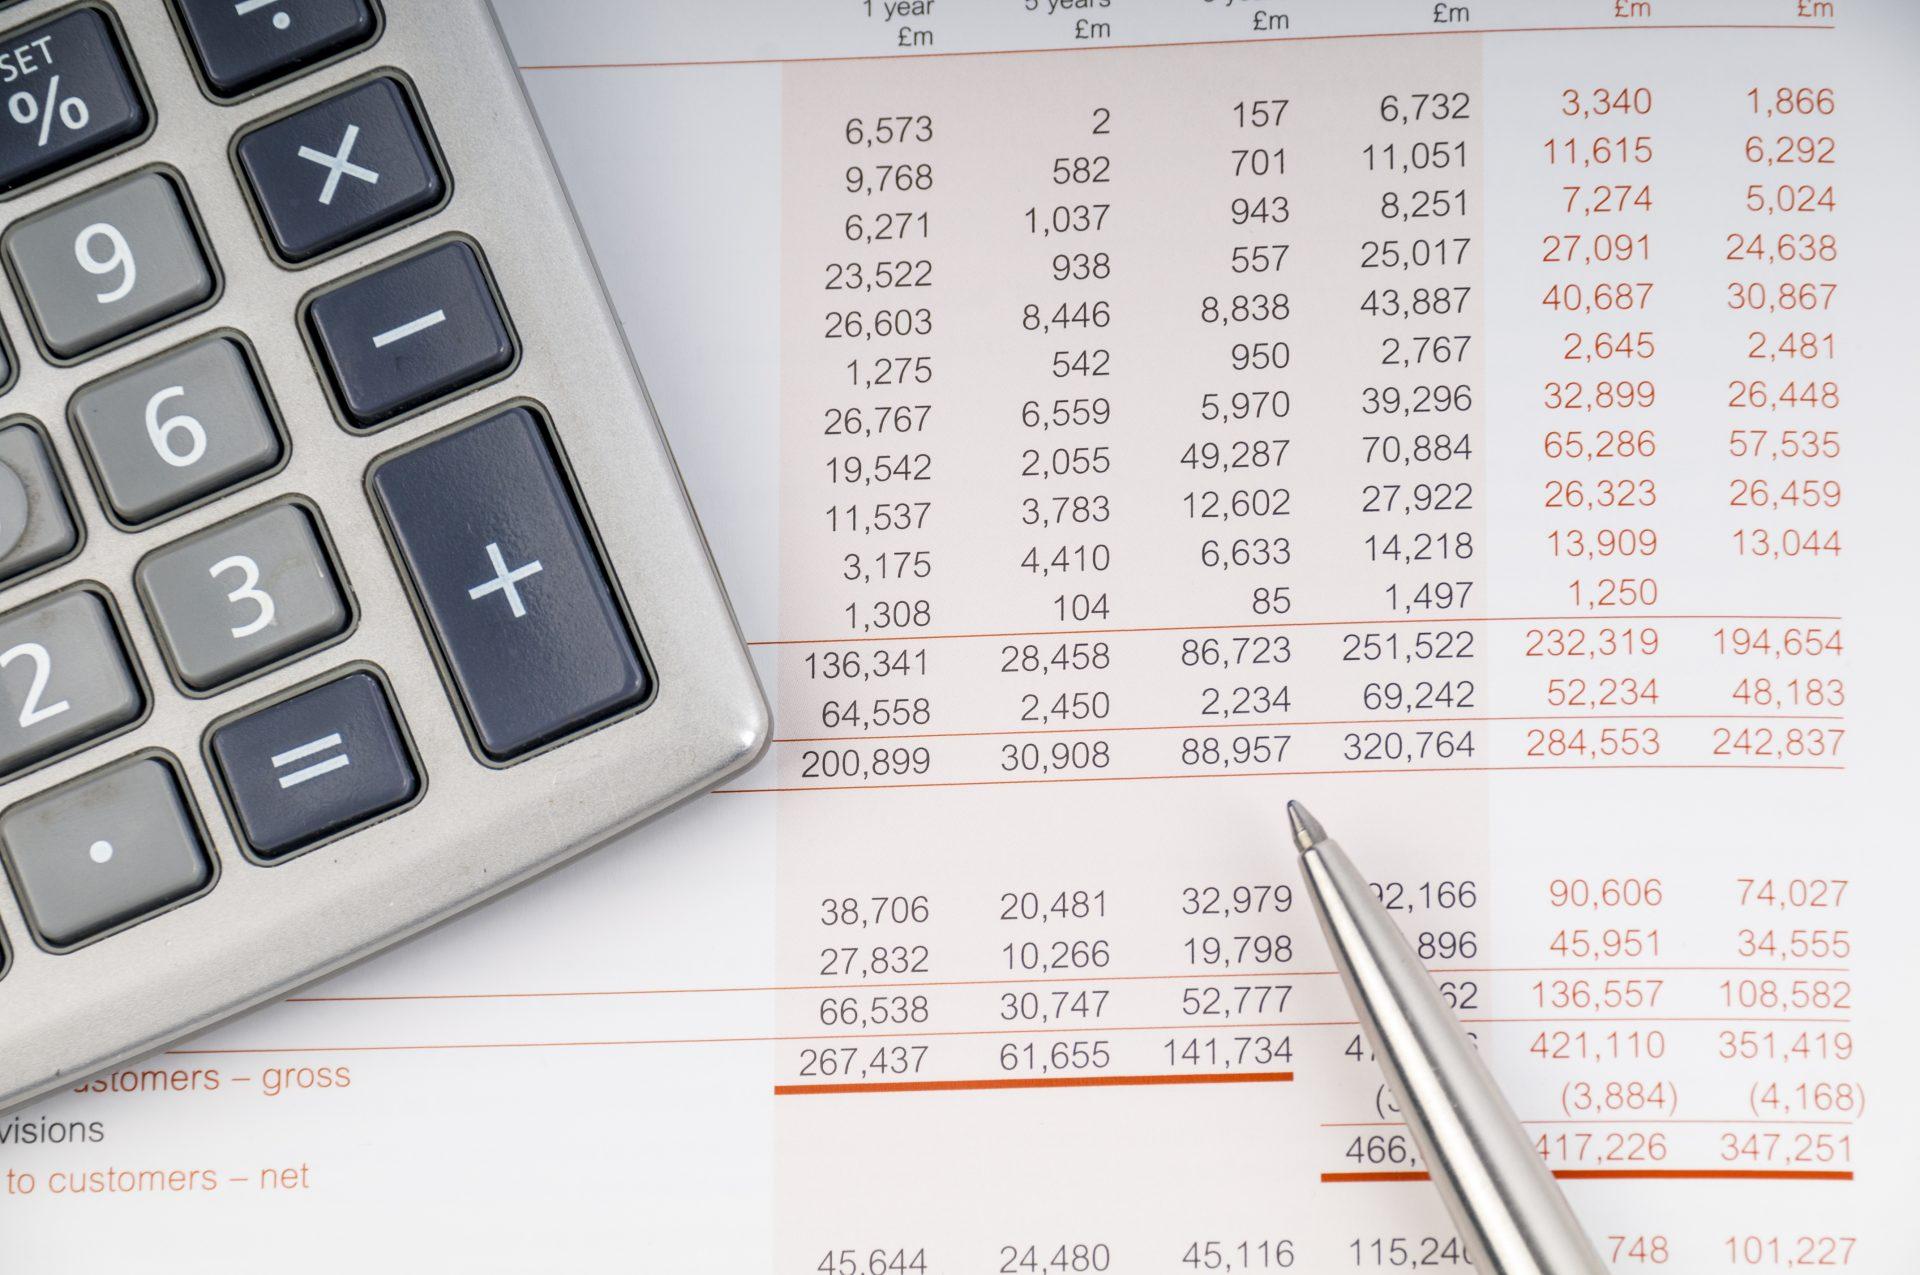 credito-consolidado-despesas-acumuladas